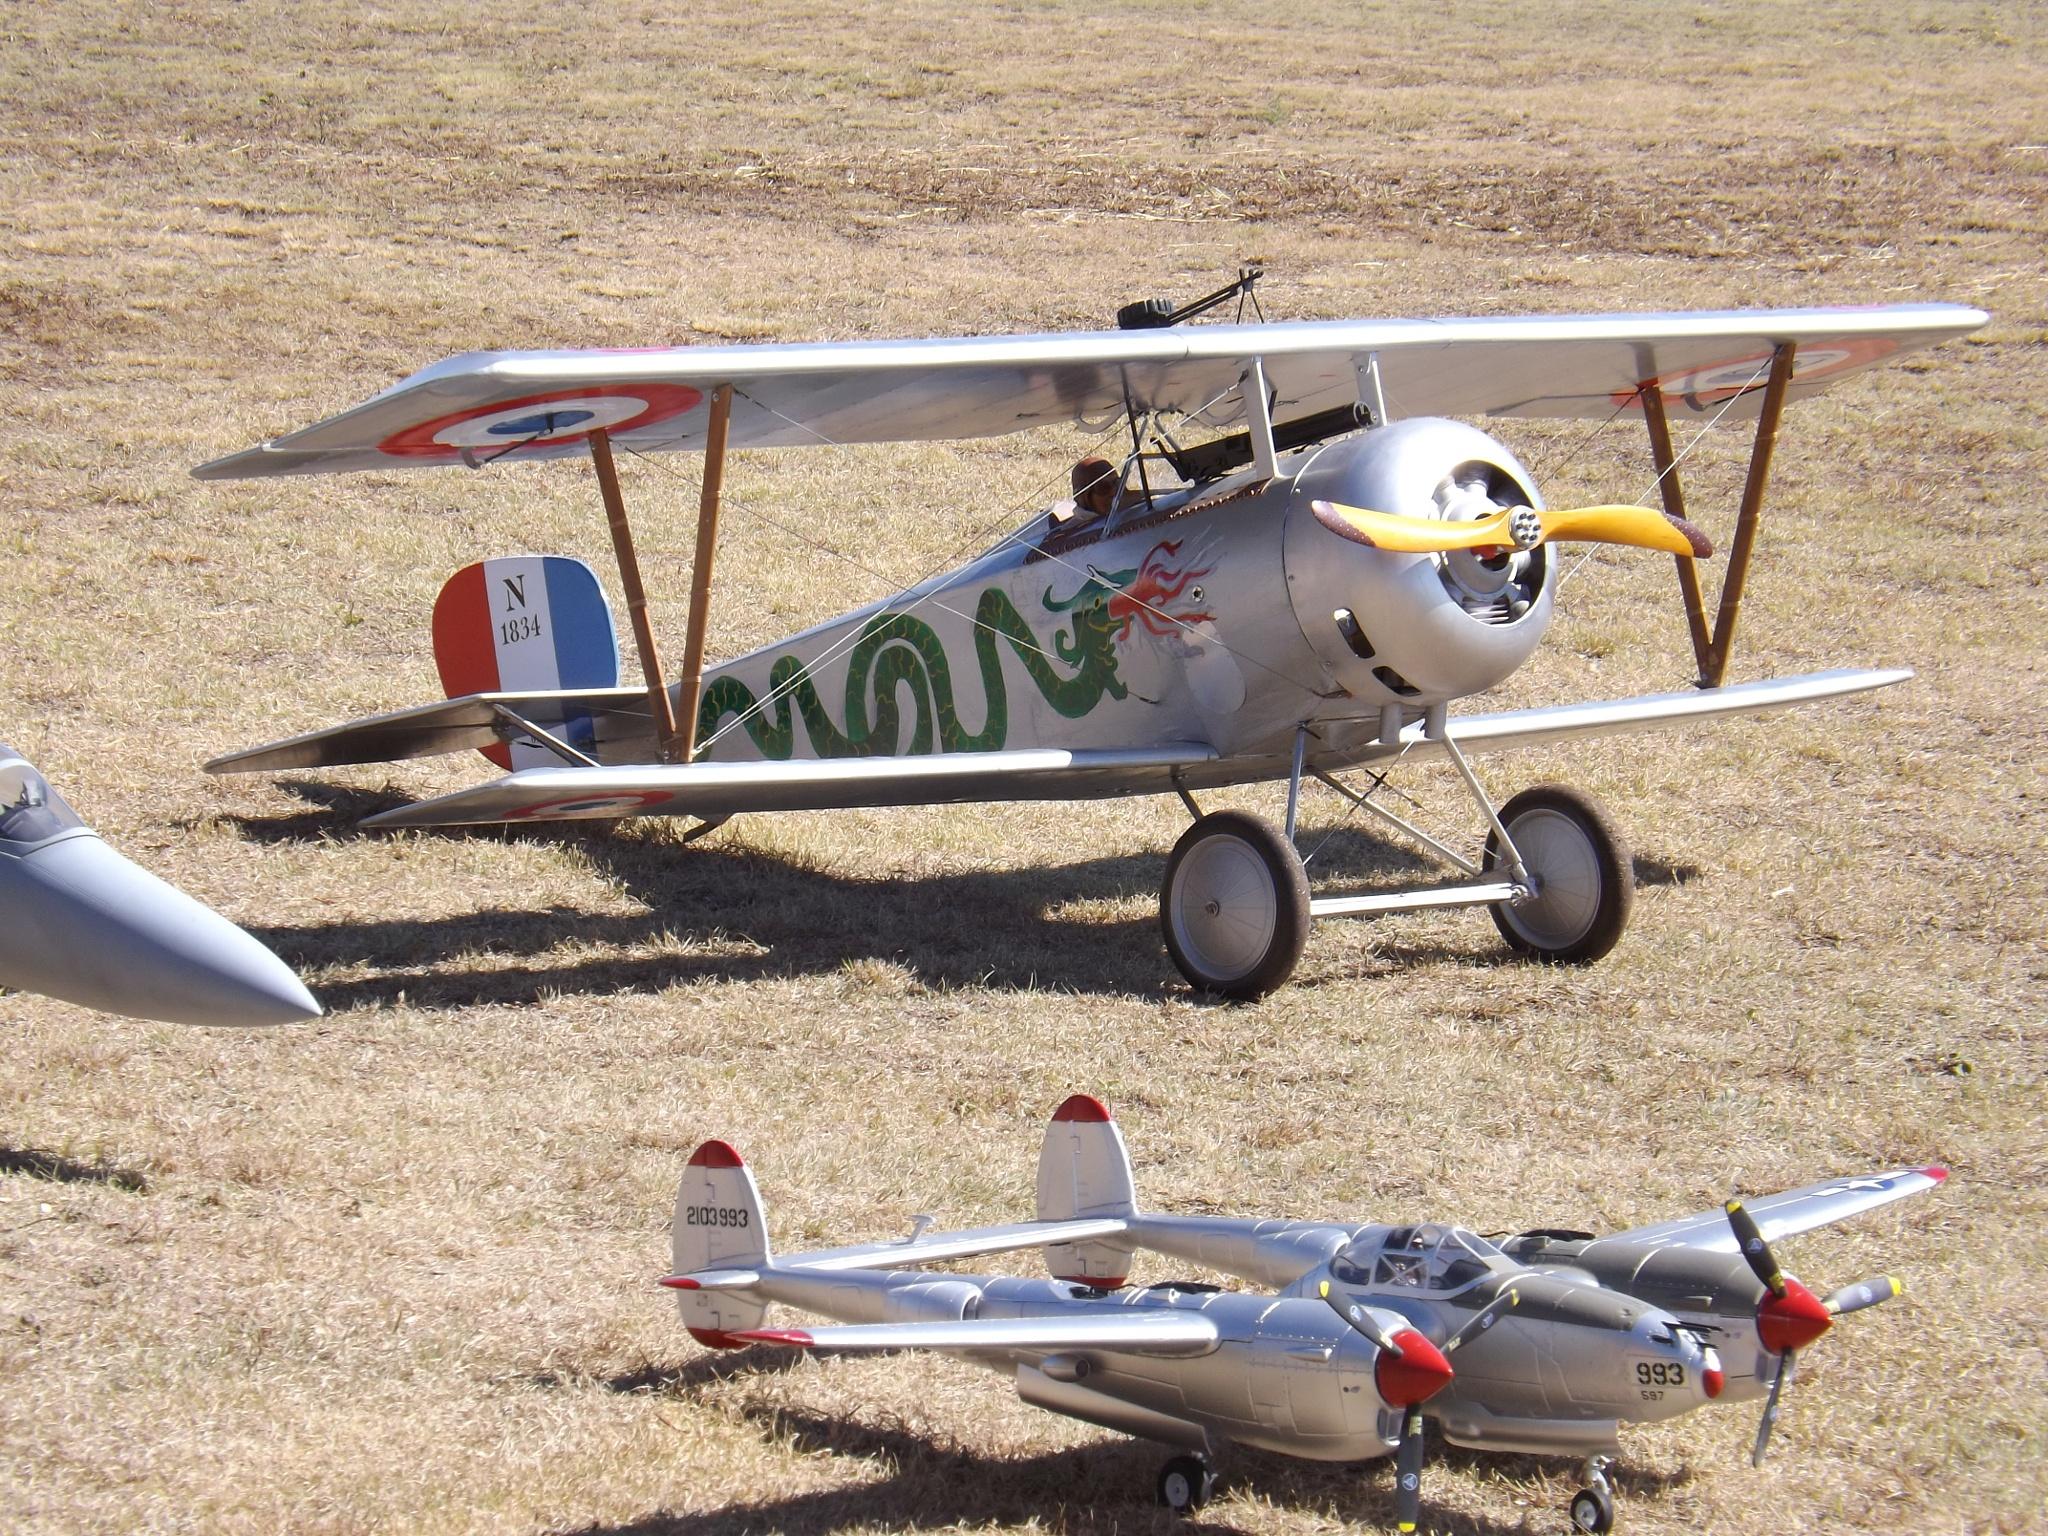 model air planes by Karen Evans